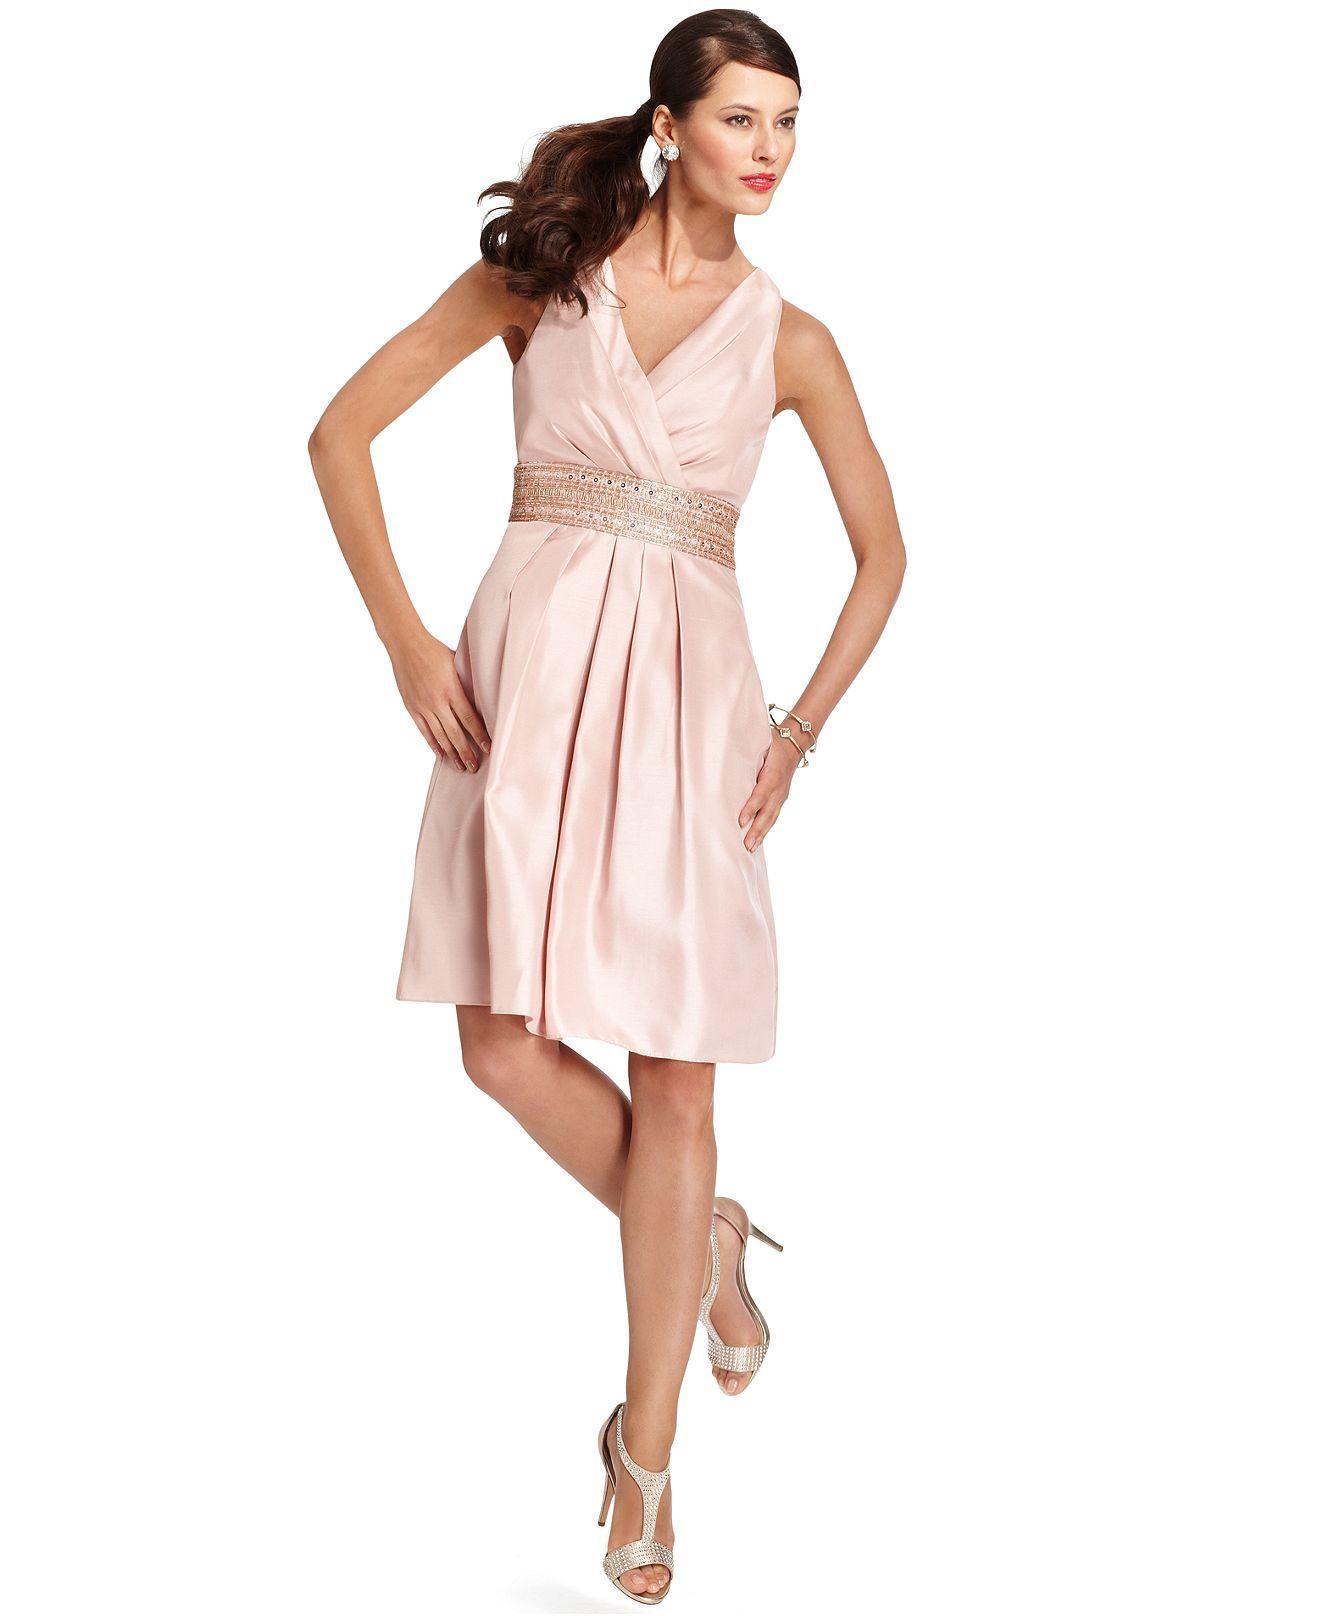 Macys womens dresses wedding  JS Boutique Dress Sleeveless Sequined Beaded ALine  Womens